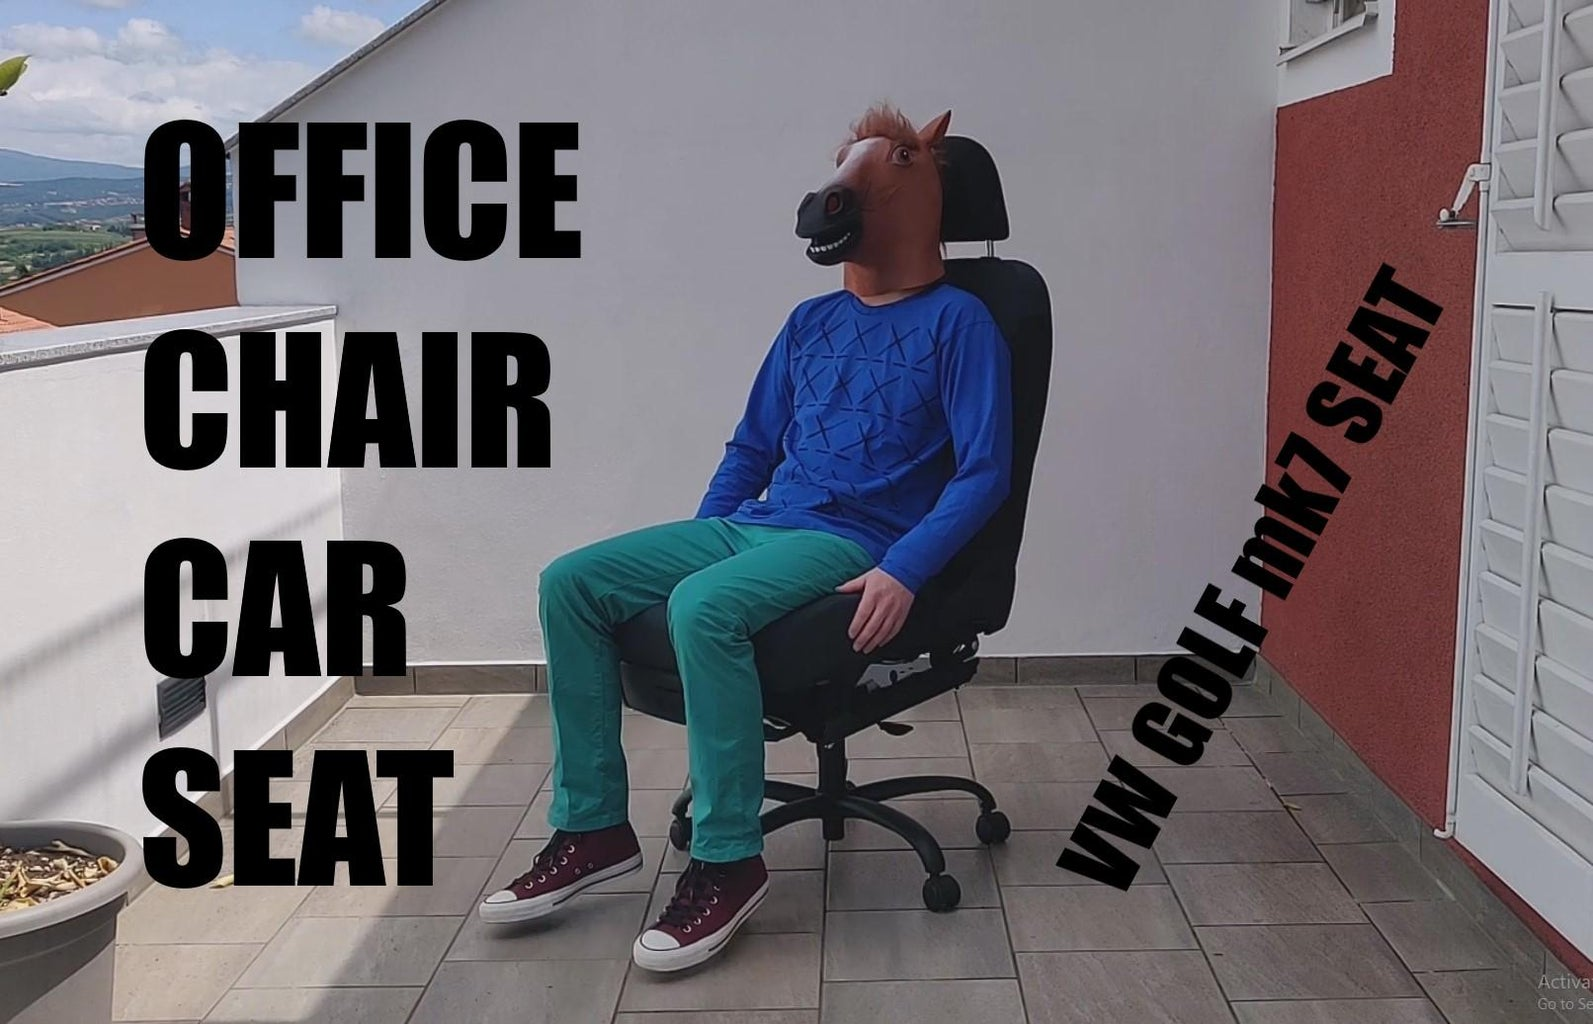 VW CAR SEAT = DIY OFFICE CHAIR